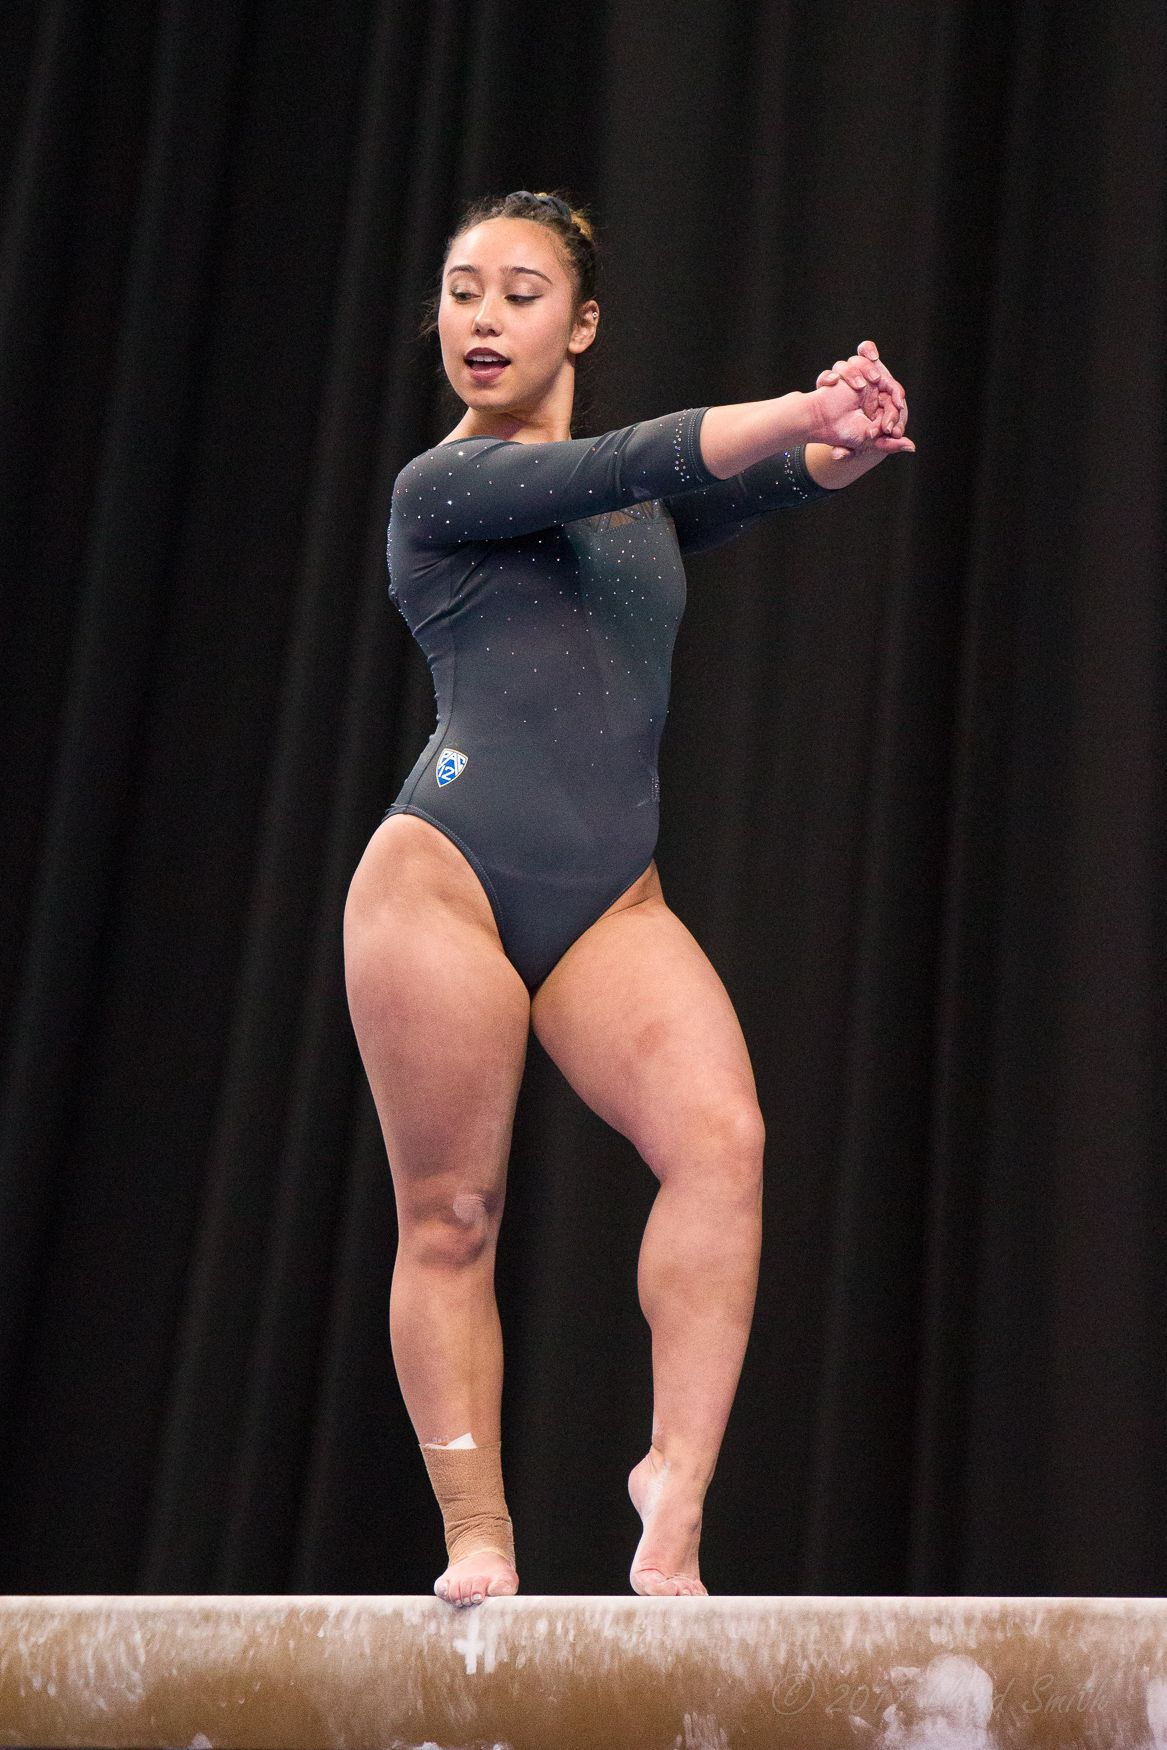 Katelyn Ohashi Katelyn Ohashi Gymnastics Photos Amazing Gymnastics